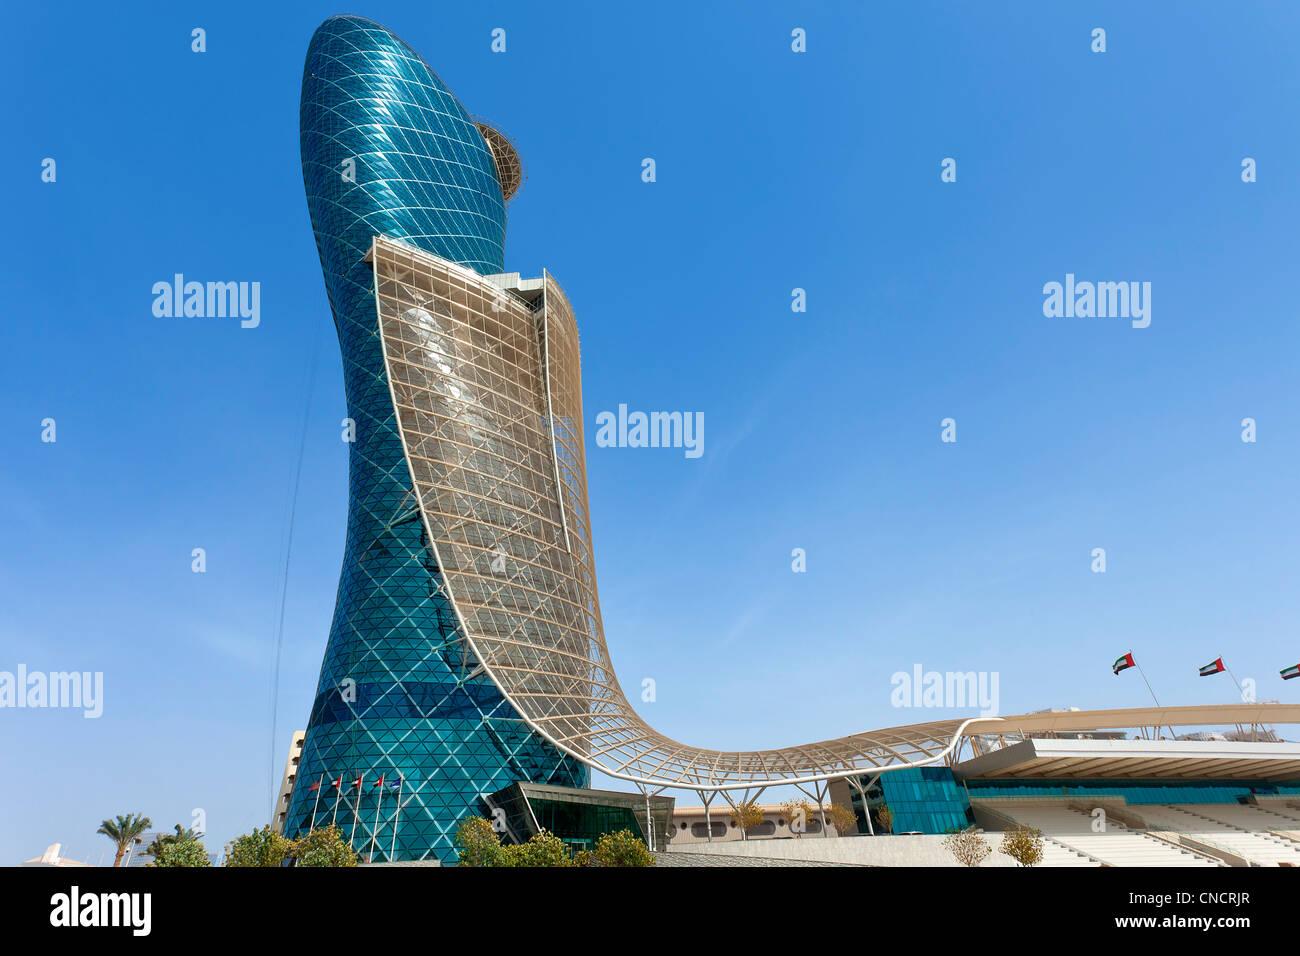 Abu Dhabi , Hyatt Capital gate Hotel - Stock Image